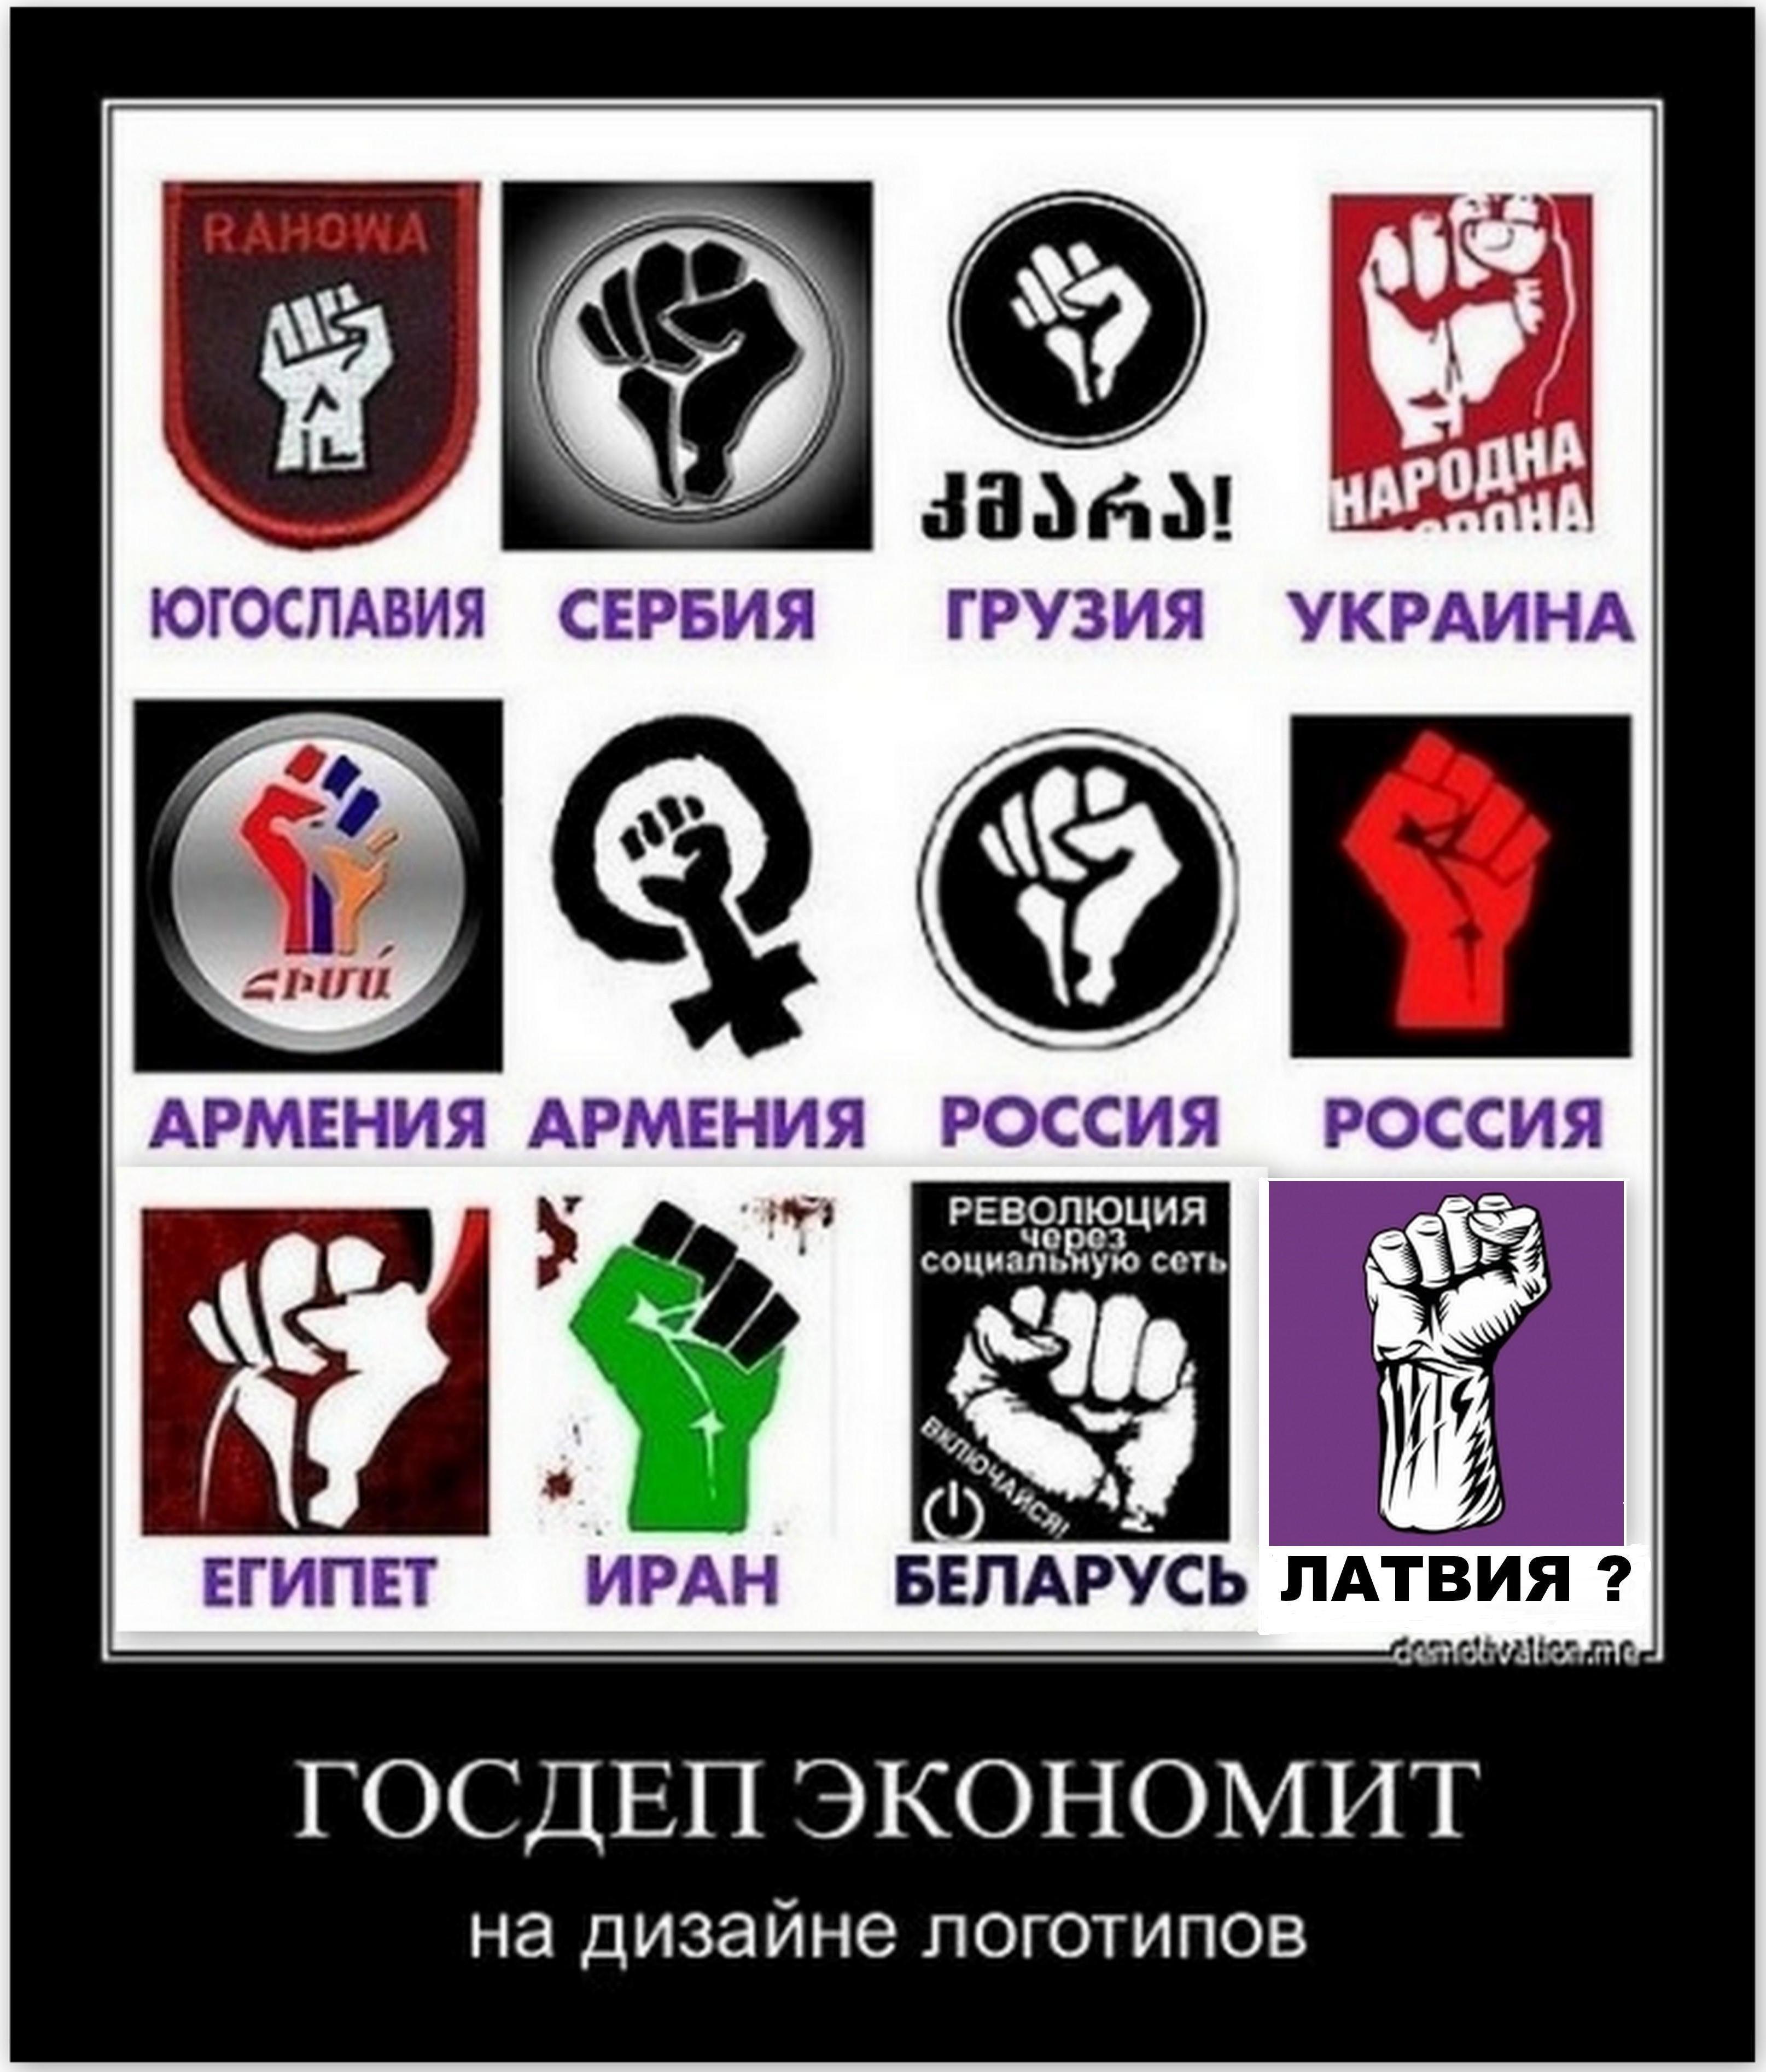 kongress_negrazdan_latvia